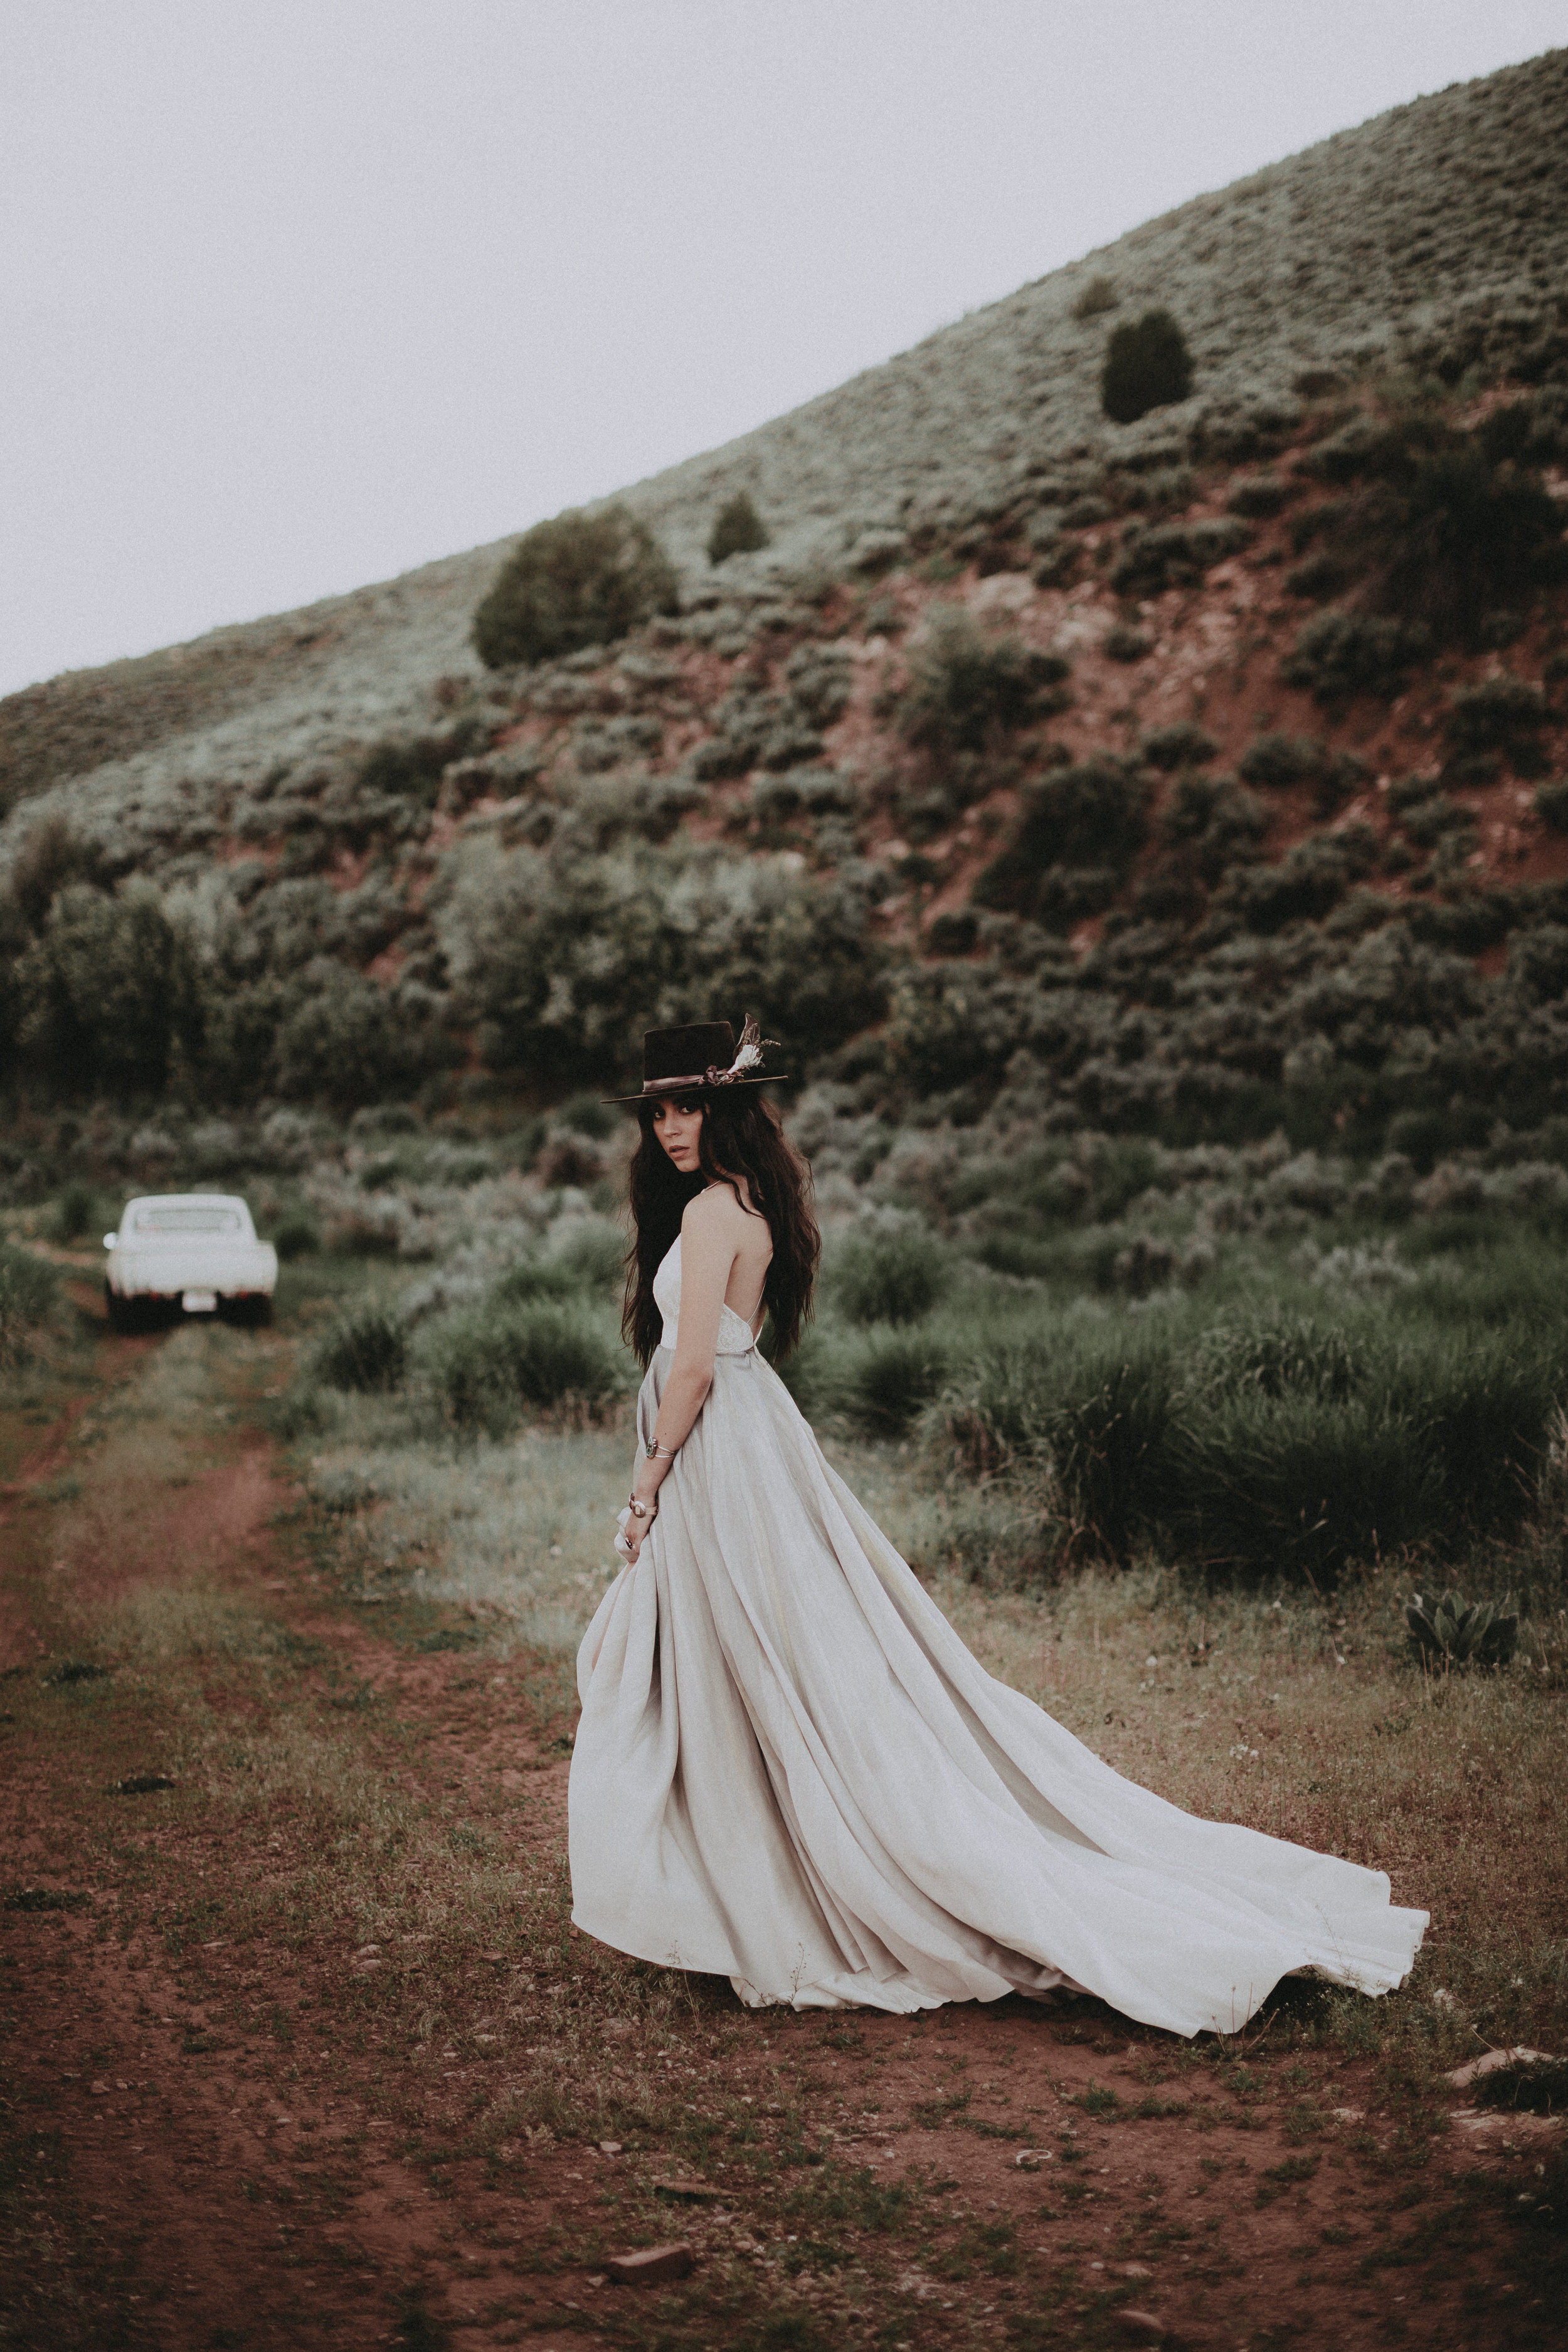 Remington by Chantel lauren hand painted grey wedding gown